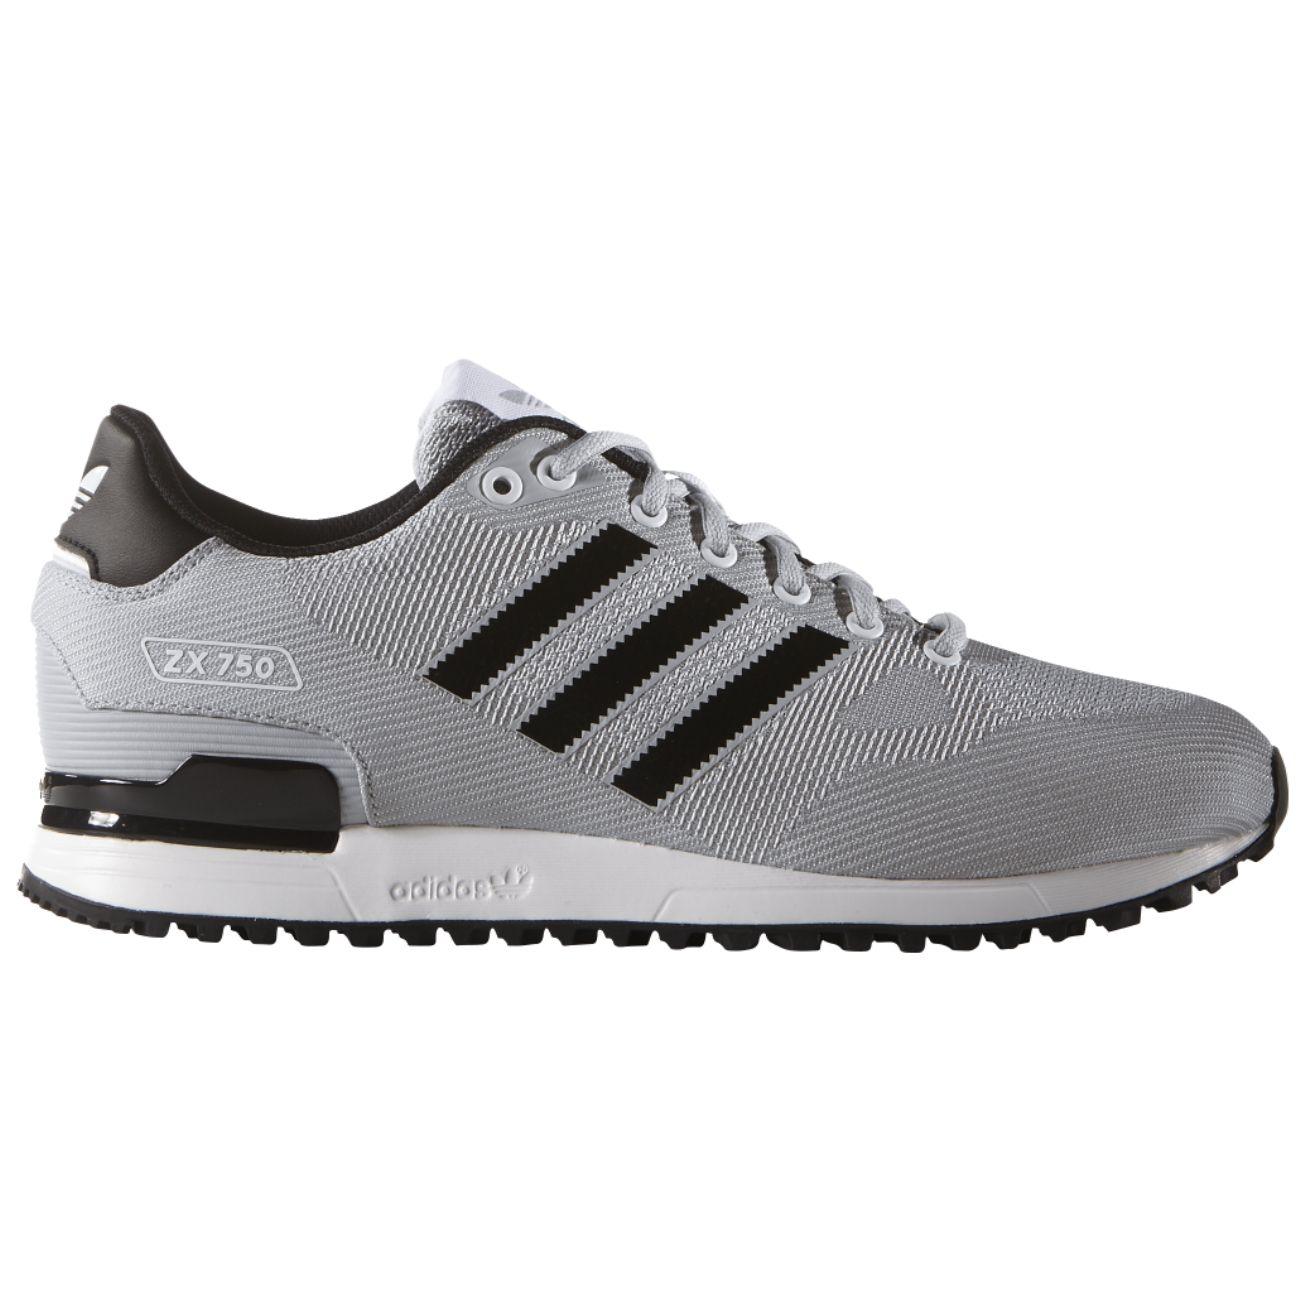 Adidas-Originals-ZX-750-Schuhe-Turnschuhe-Sneaker-Herren